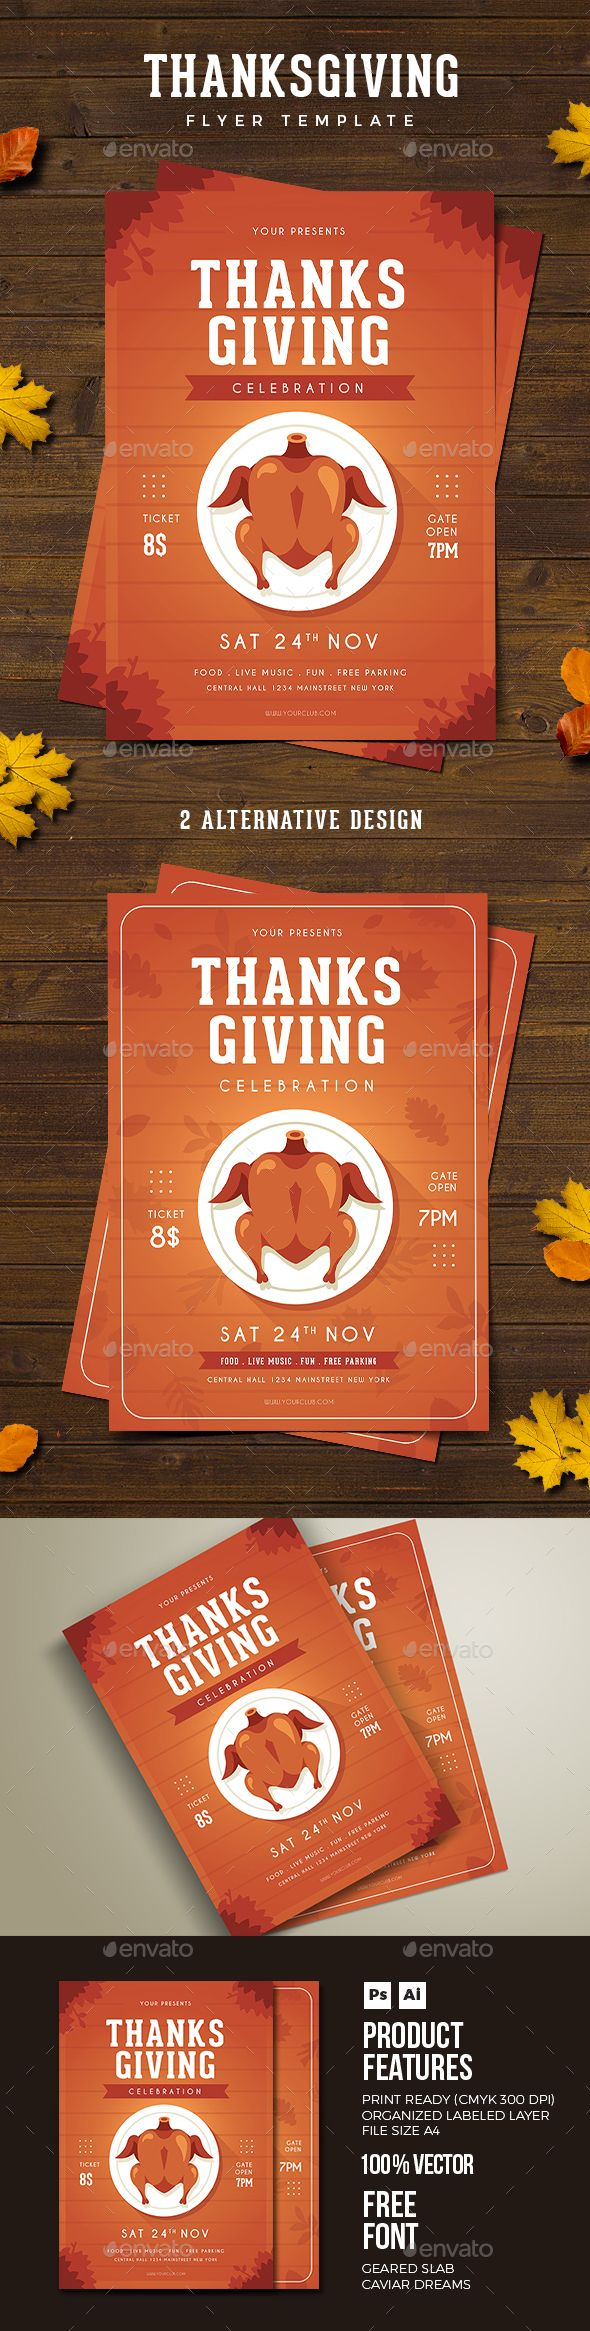 Thanksgiving Flyer Pinterest Ai Illustrator Flyer Template And